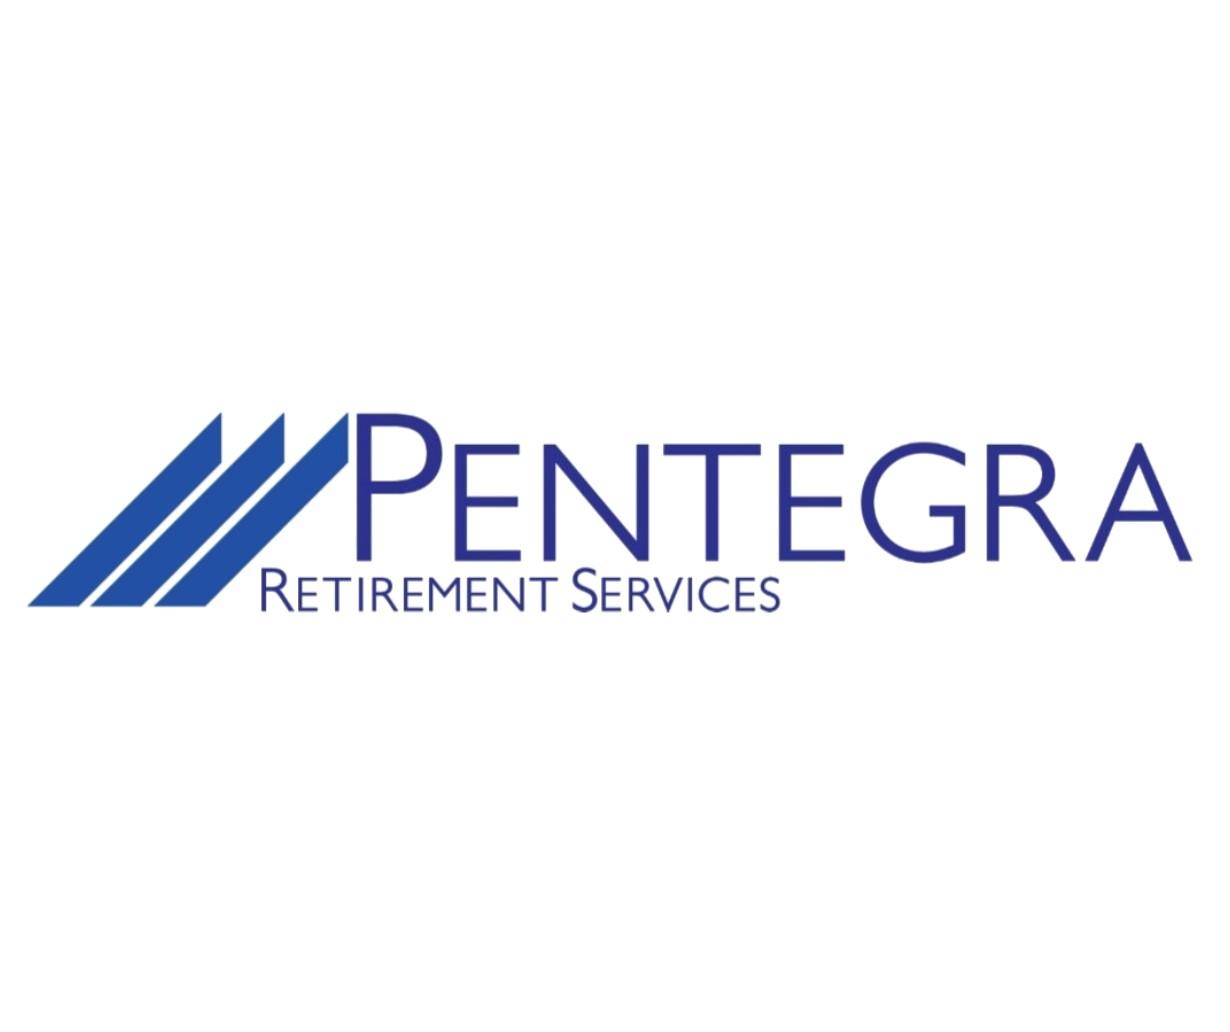 Pentegra-Logo-ConventionSponsor-Reel-3